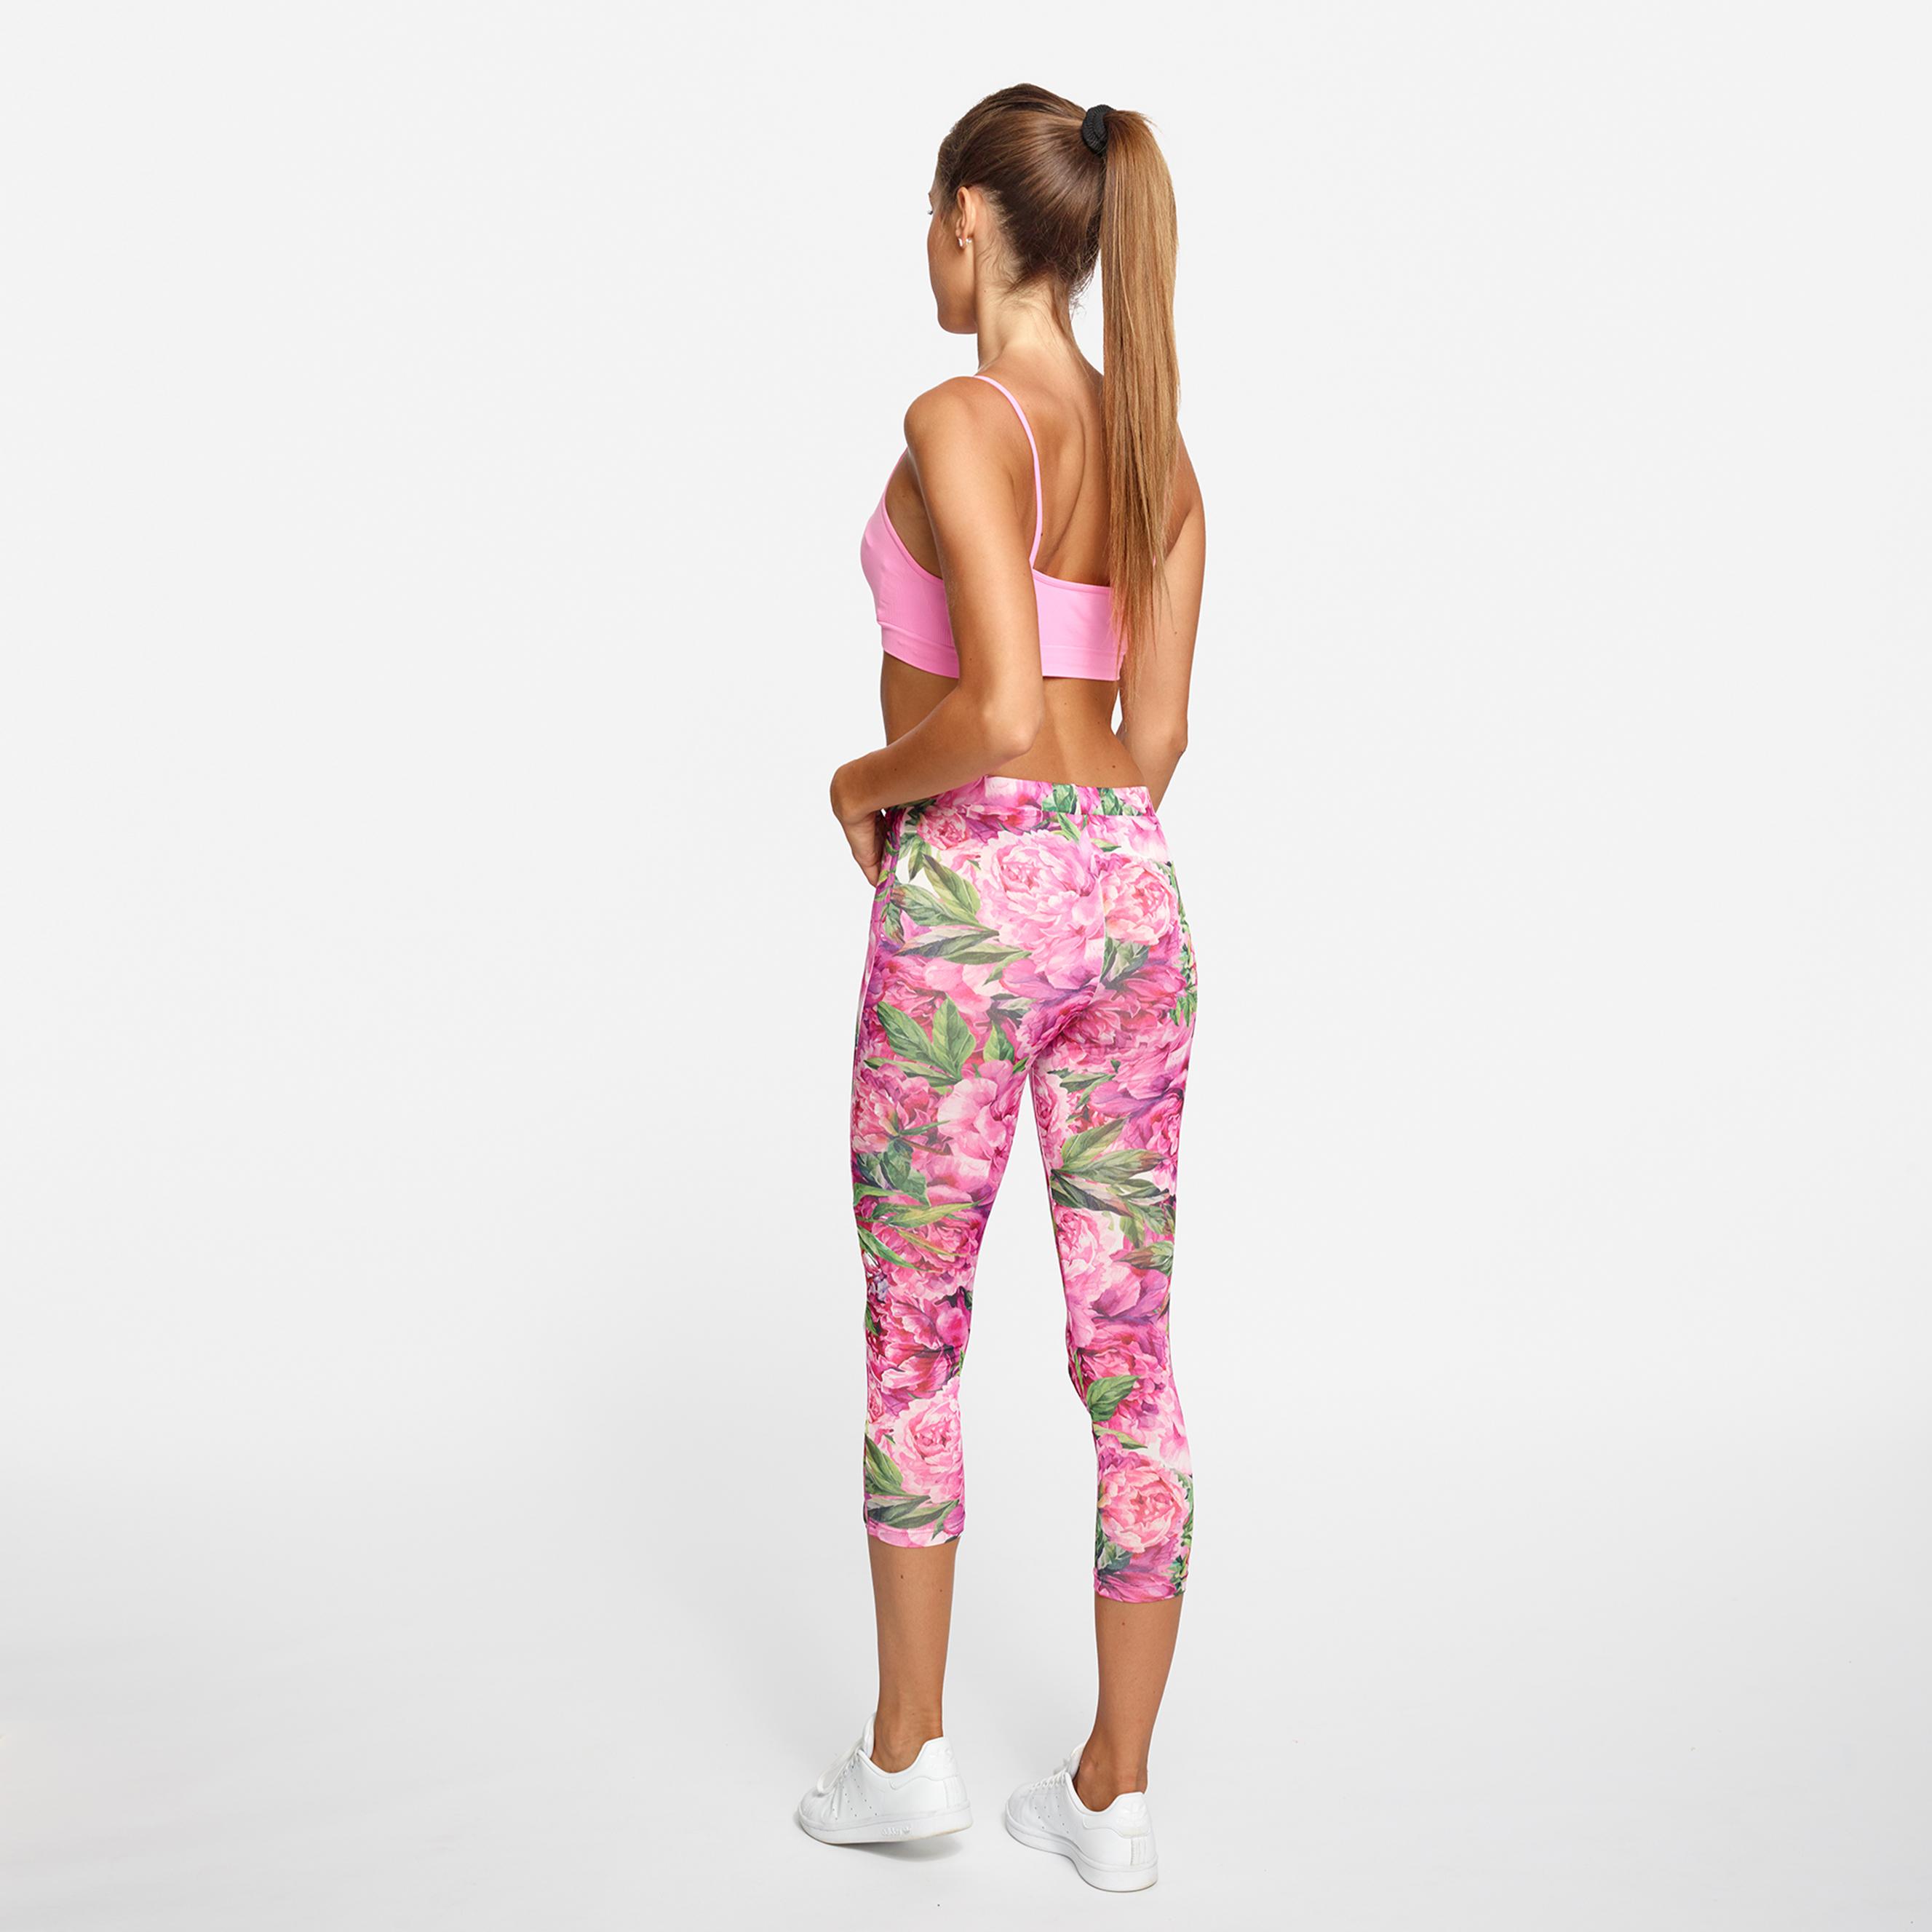 leggings fitness Yogashion stampa fiori